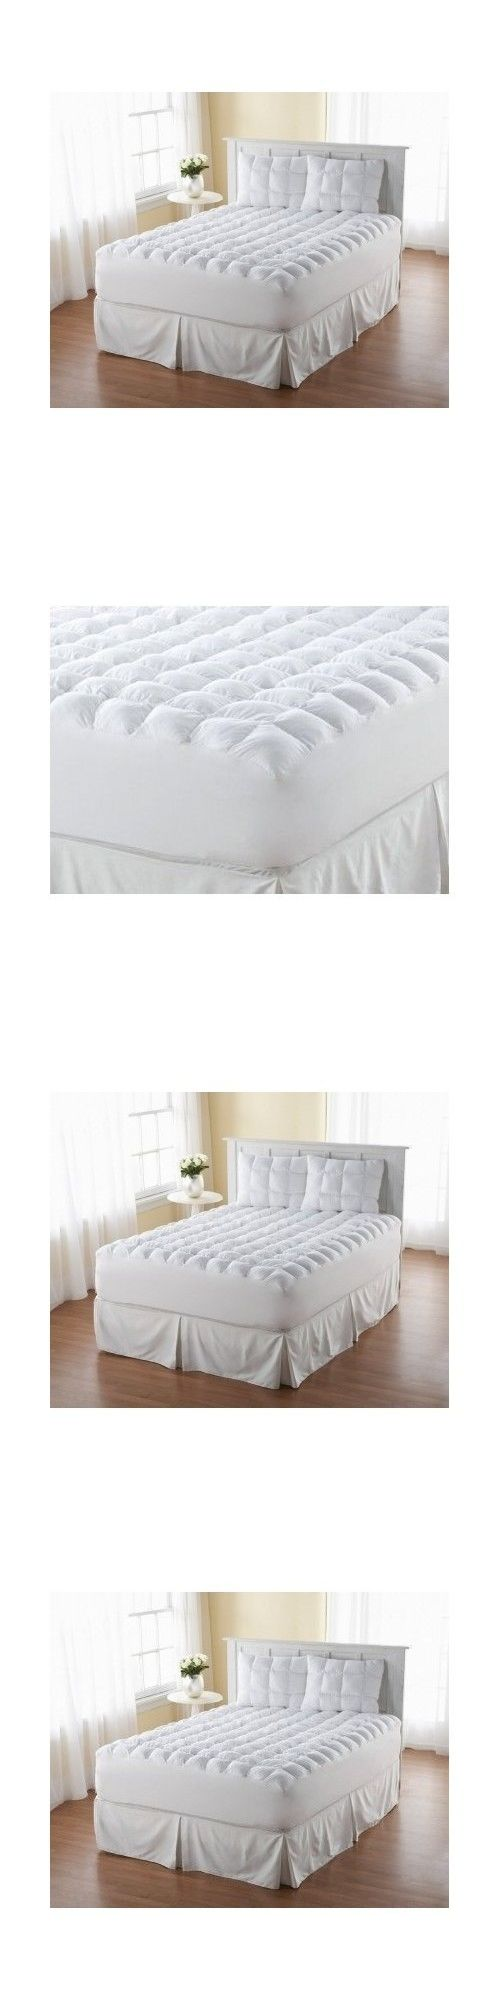 Mattress Pads and Feather Beds 175751: California King Cal Pillow Top Mattress  Topper Matres Pad